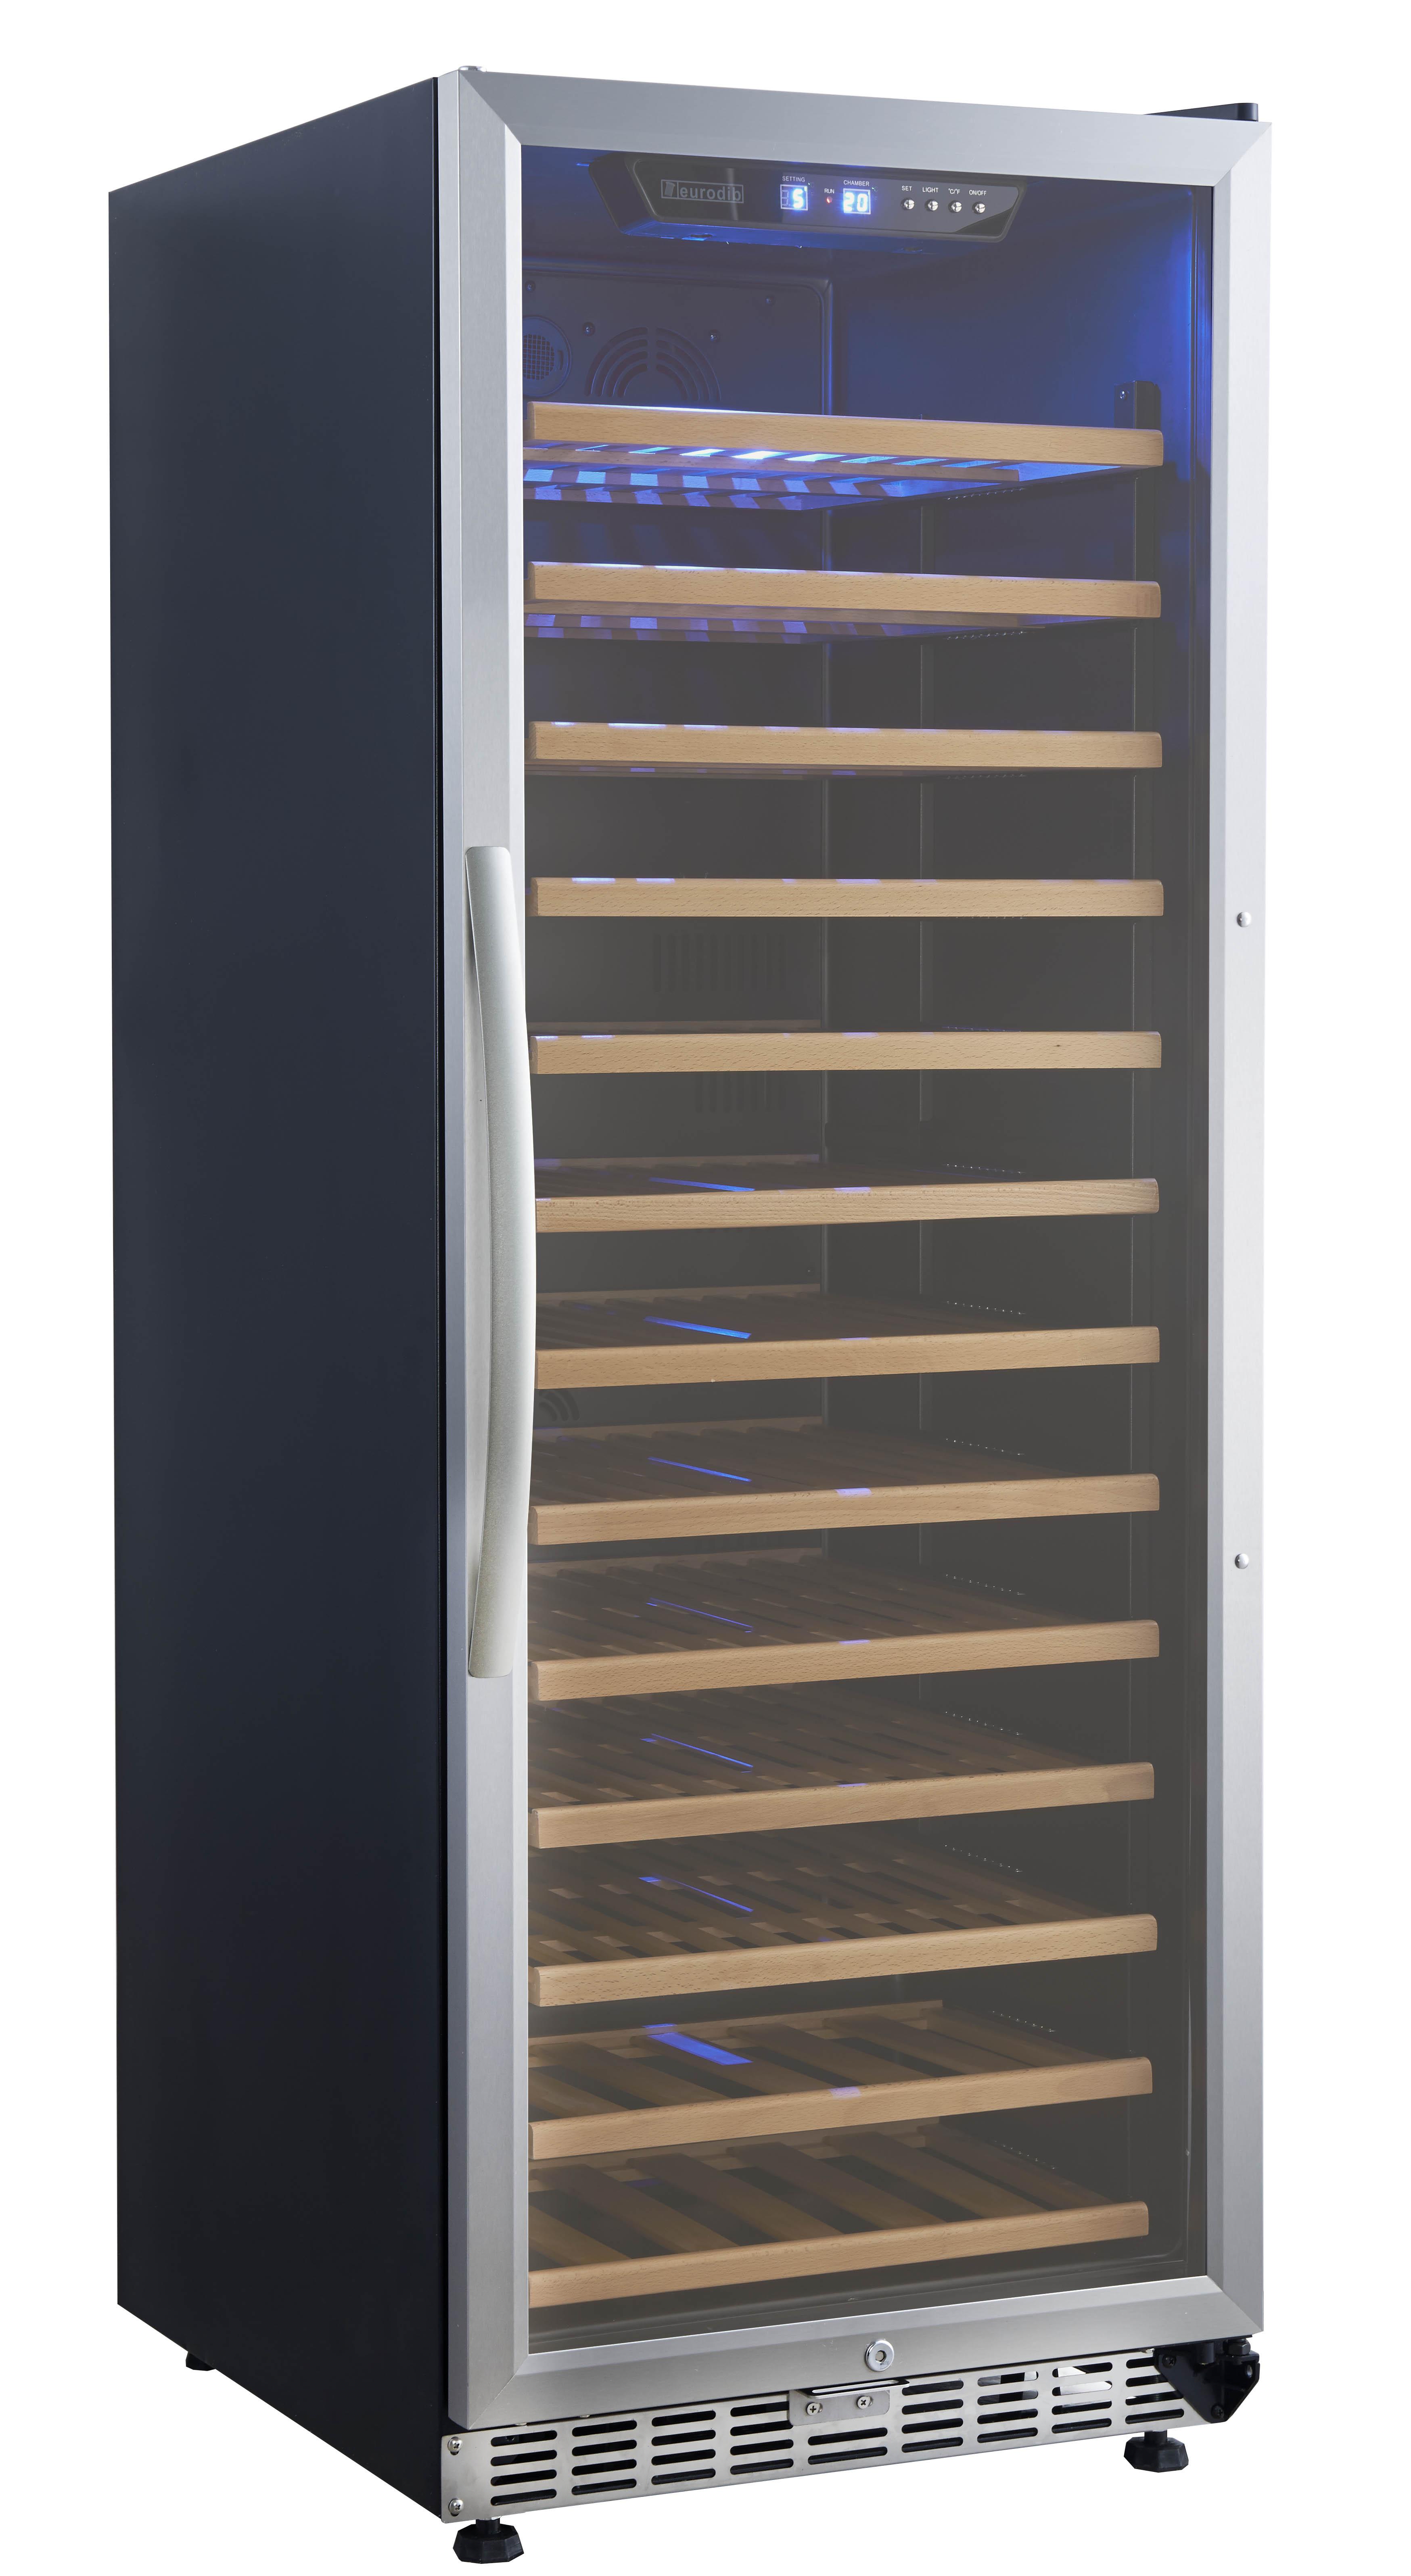 Eurodib USA USF128S wine coolers